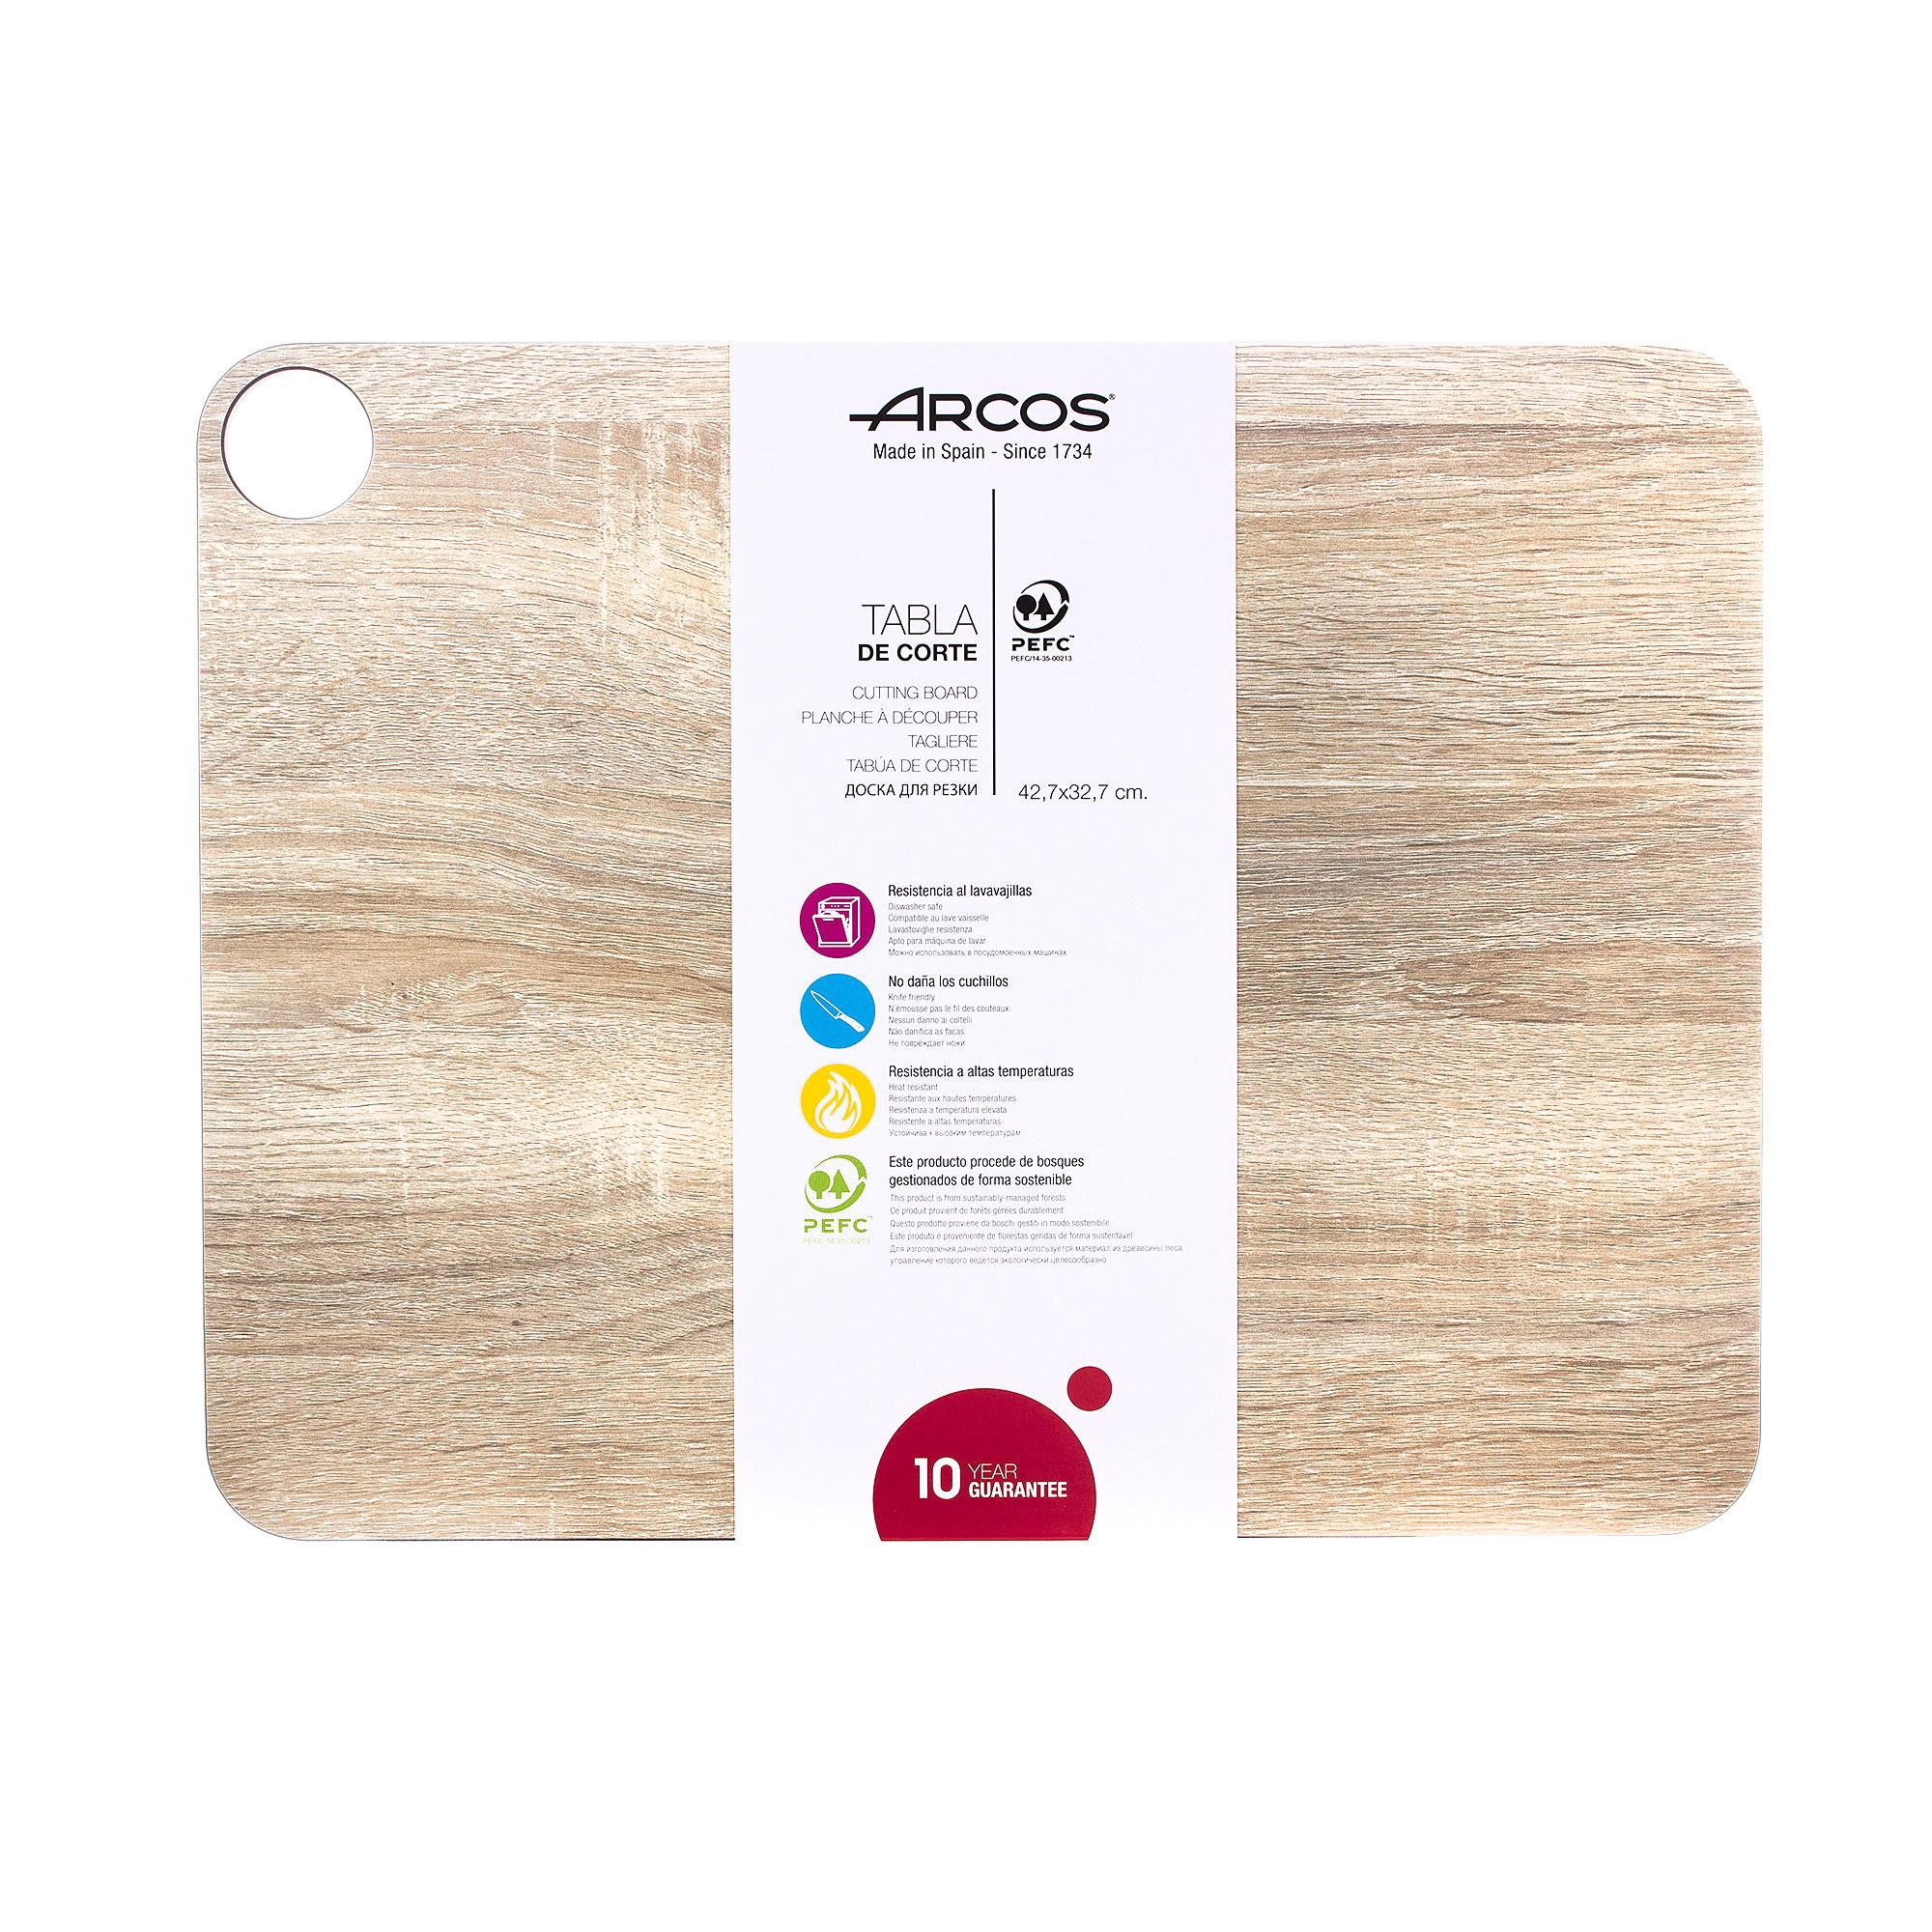 Доска разделочная Arcos Accessories 42,7х32,7 см доска разделочная arcos accessories 24х14 см